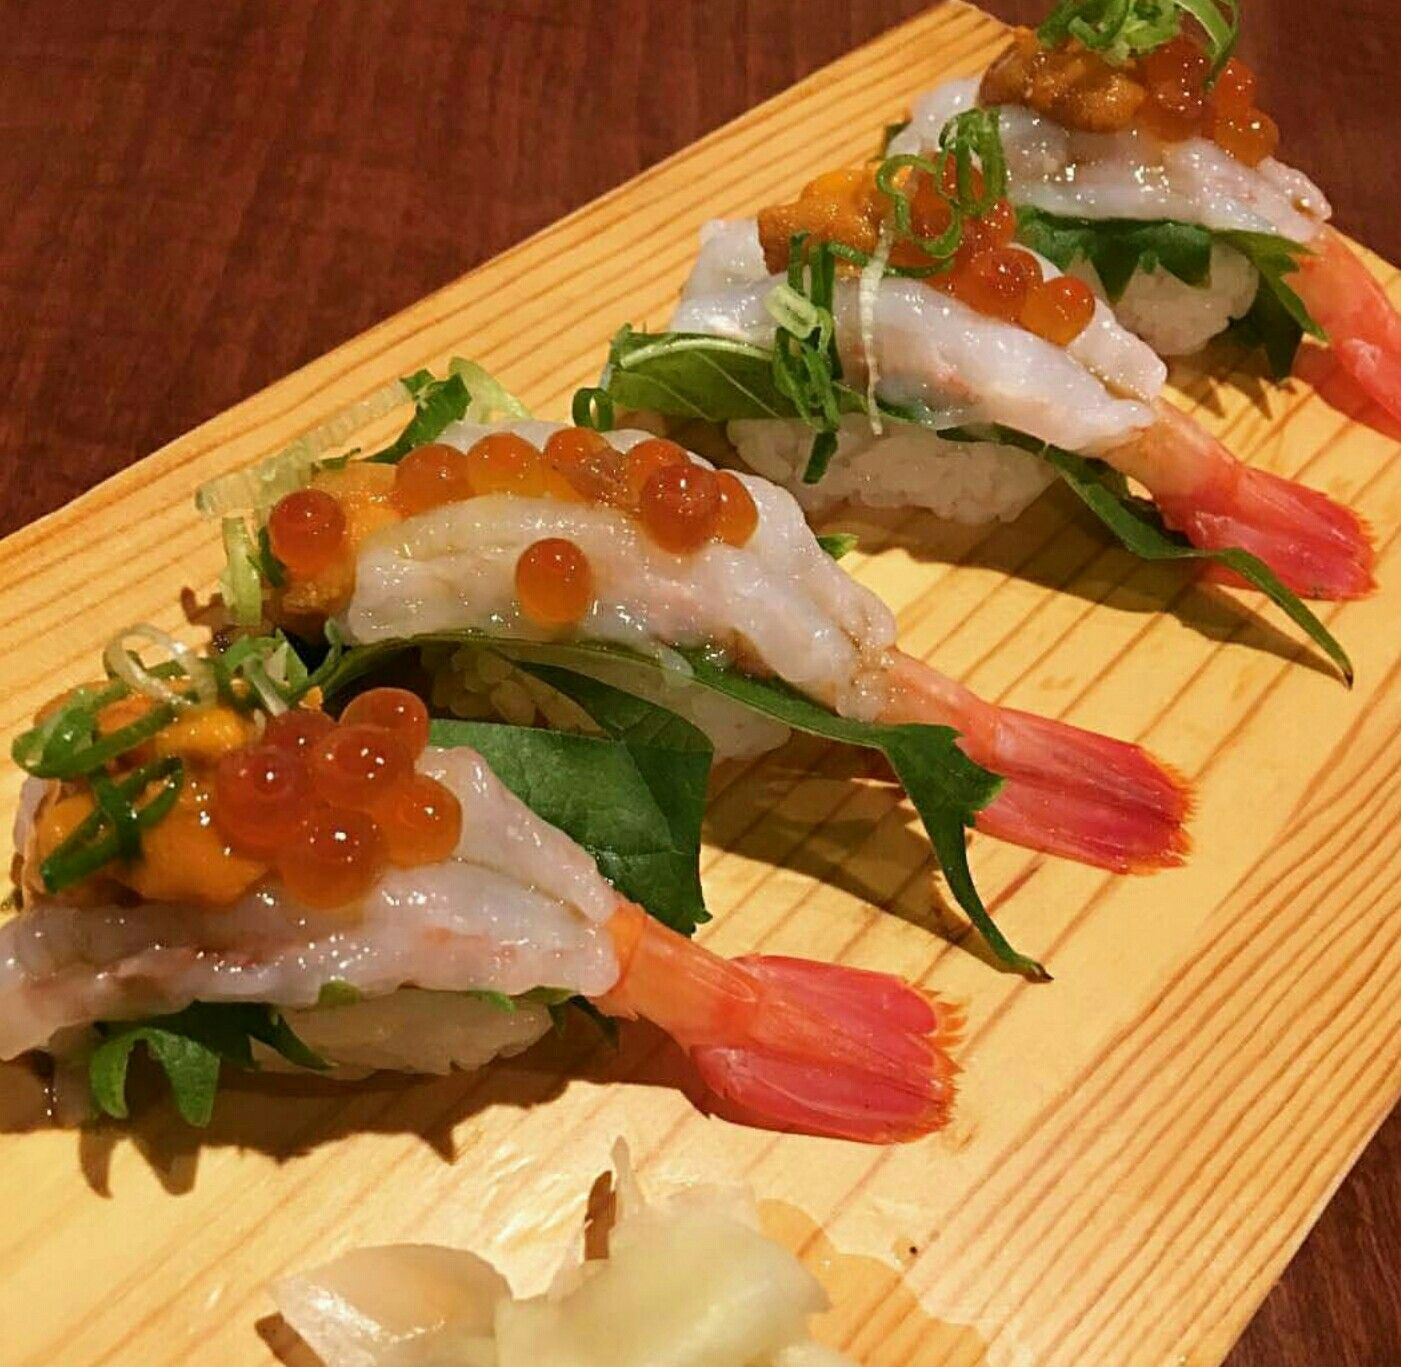 Raw Shrimp Roes Urchin Yummmmy Sashimi Sushi For Reference